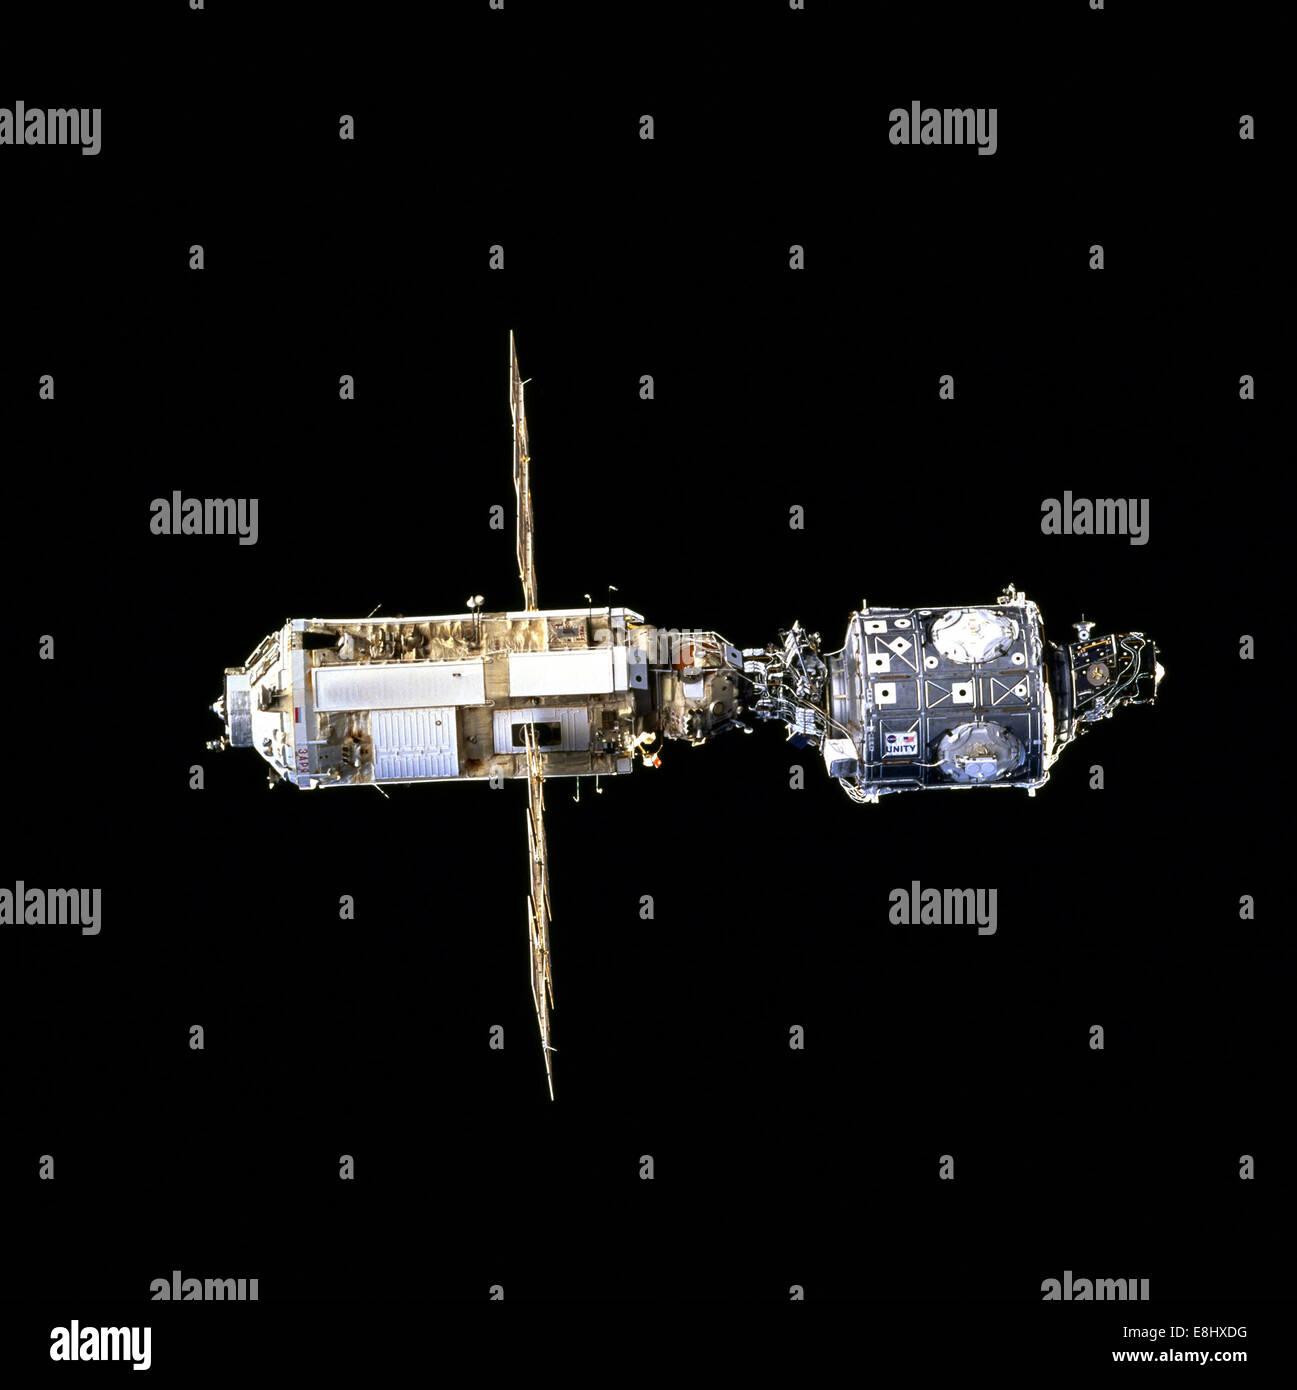 Ersten Montageschritt (Archiv NASA, internationale Raumstation Stockbild